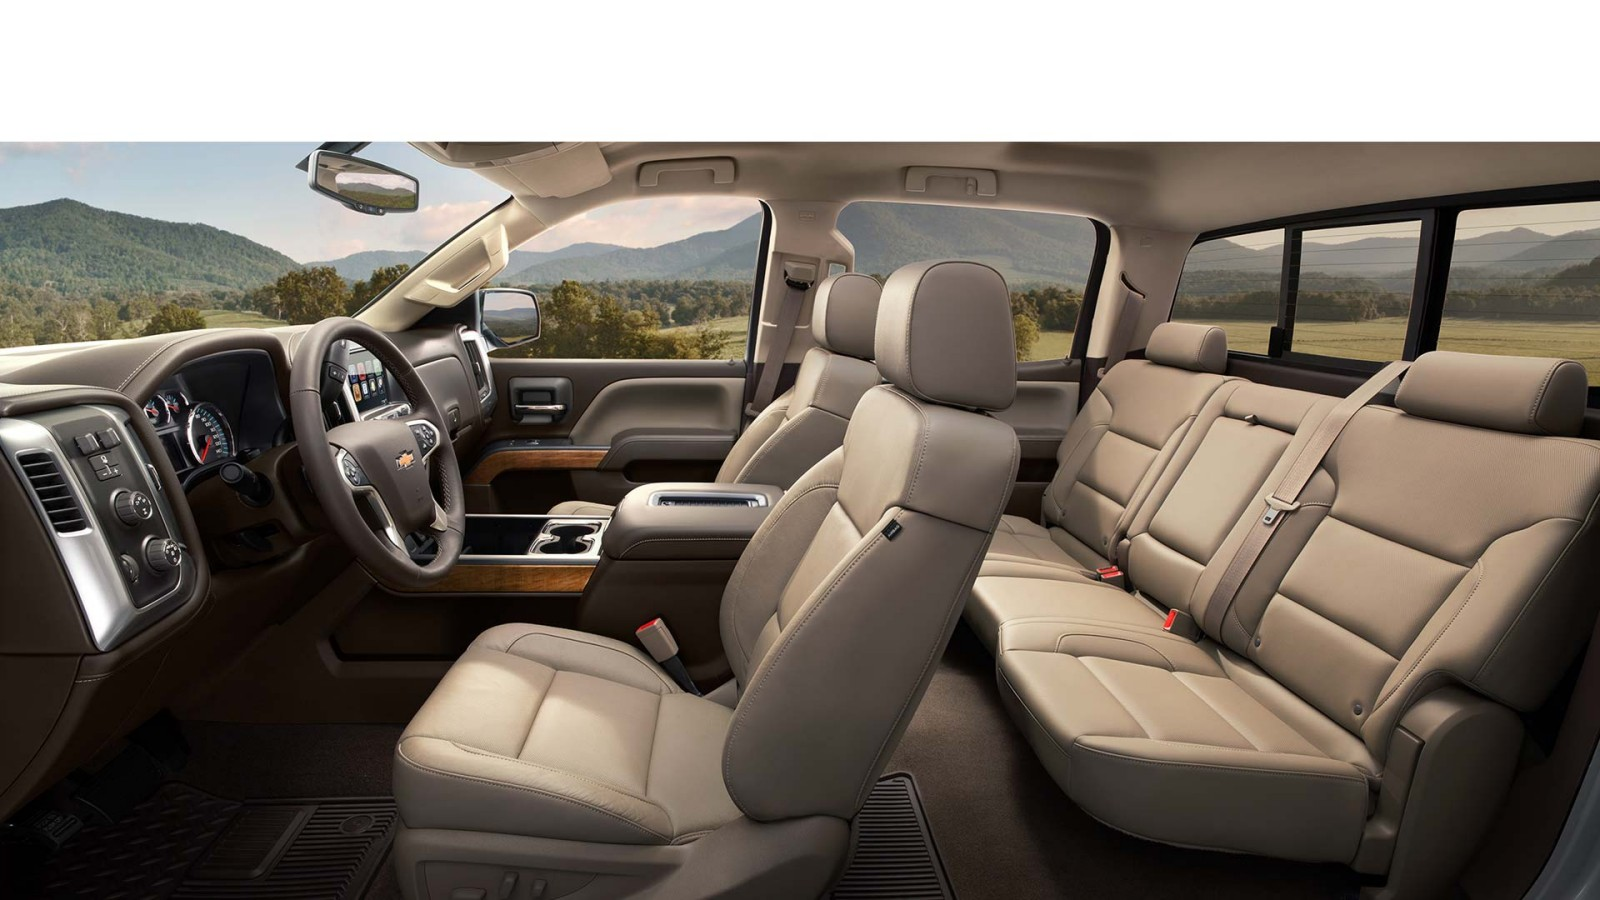 New Chevrolet Silverado 2500 Interior main image